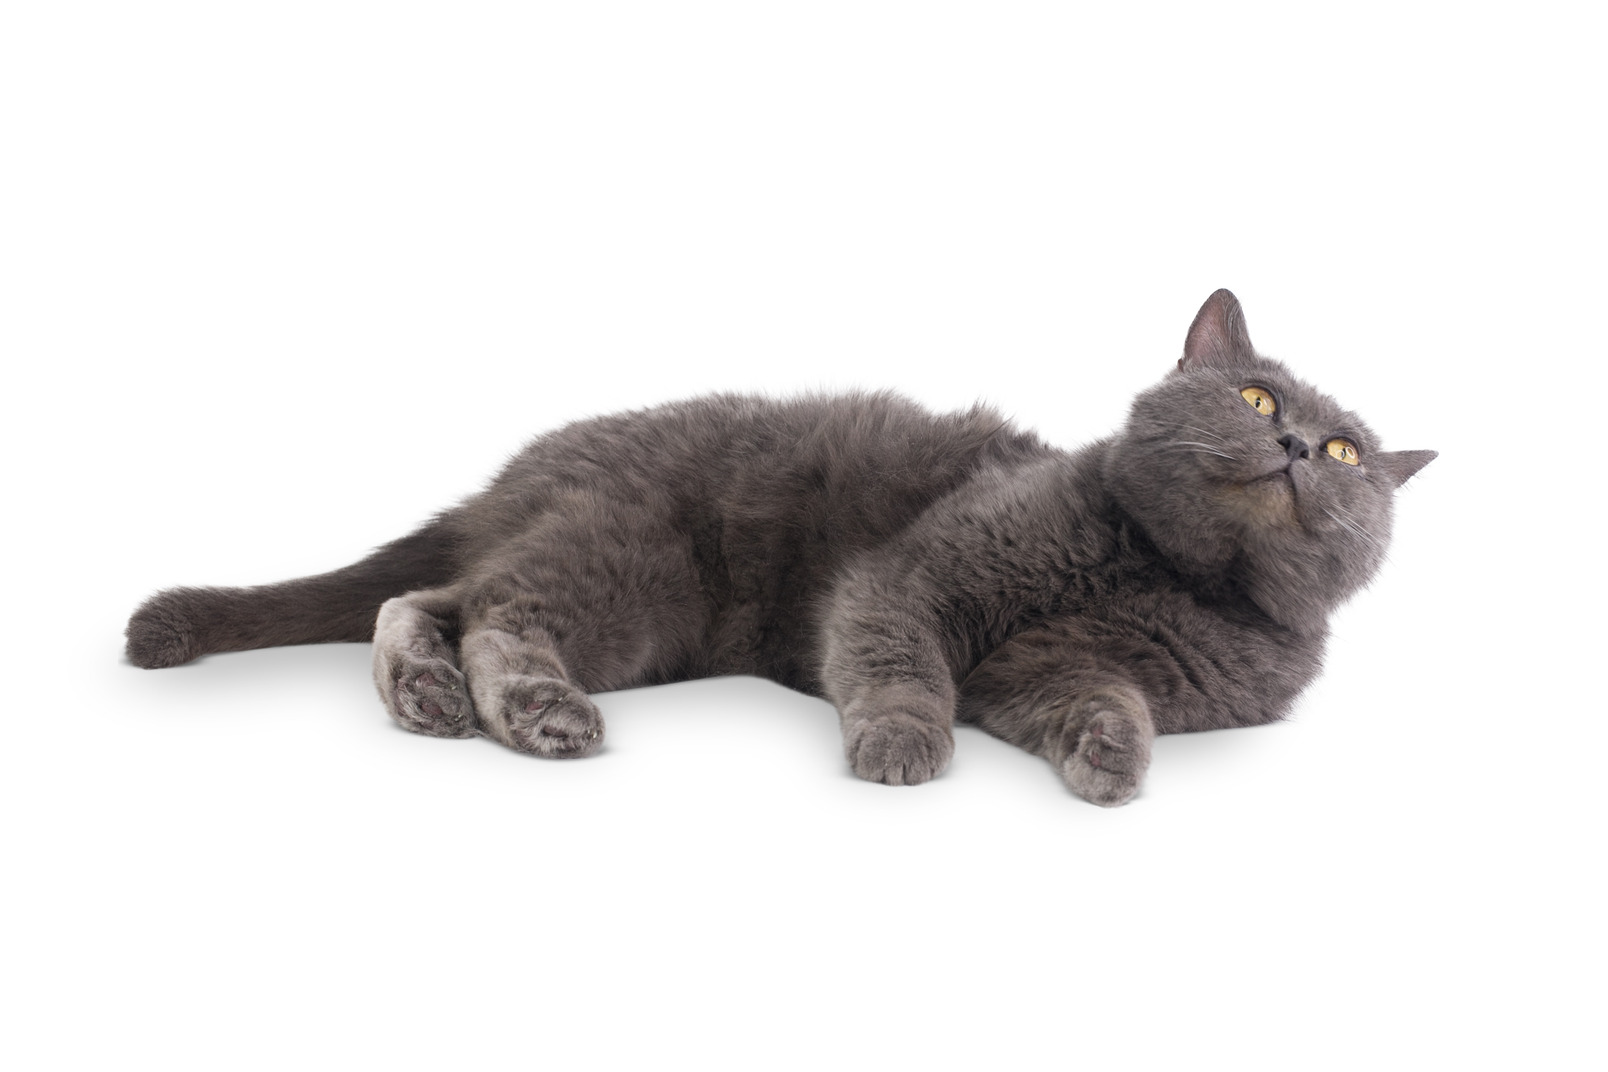 Grey cat lying on its side